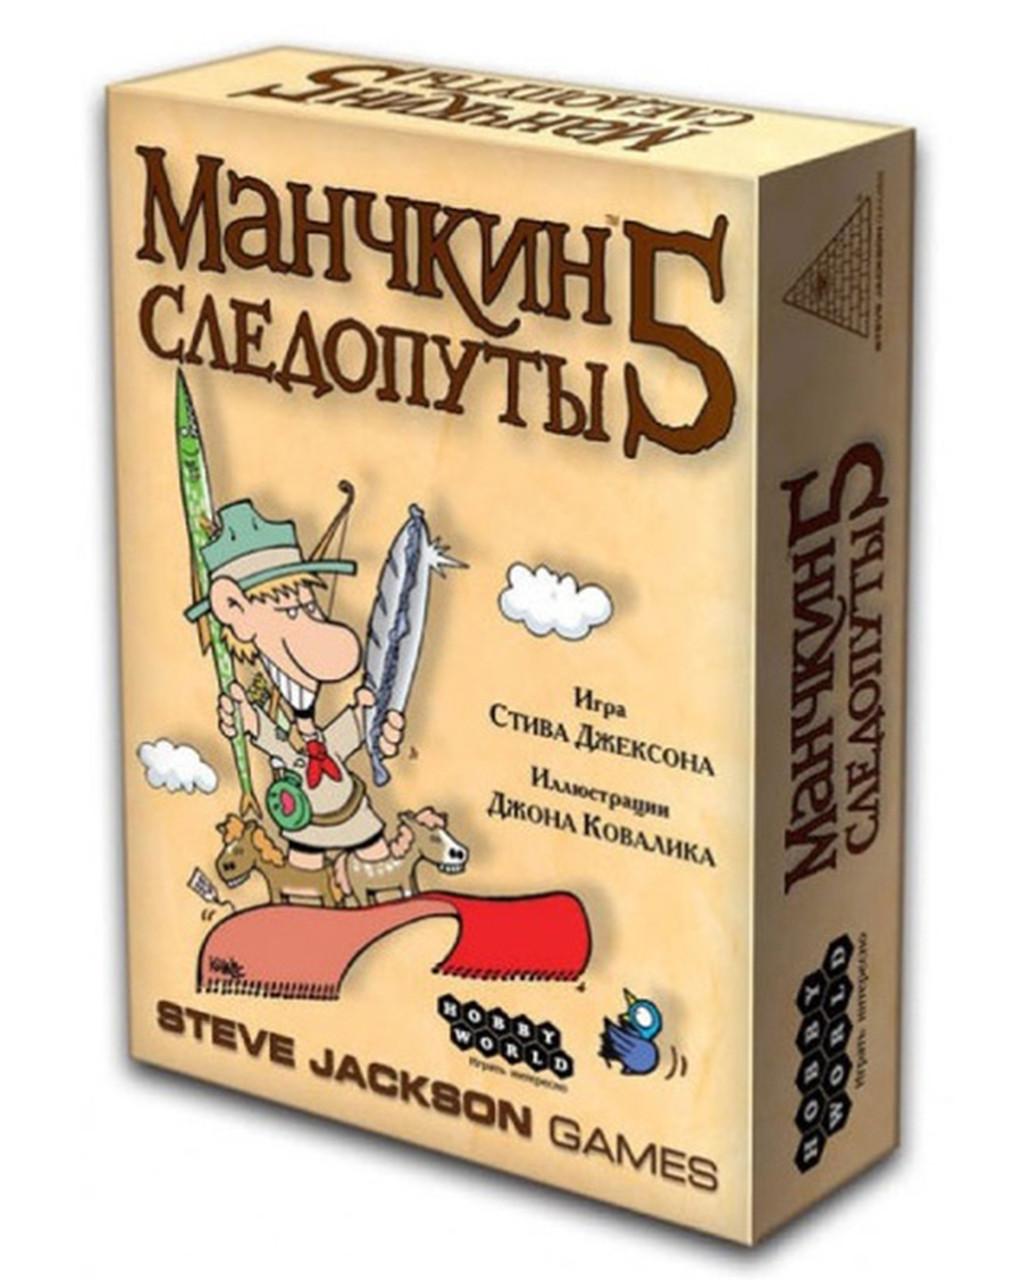 Манчкин 5. Следопуты (2-е.рус.изд)